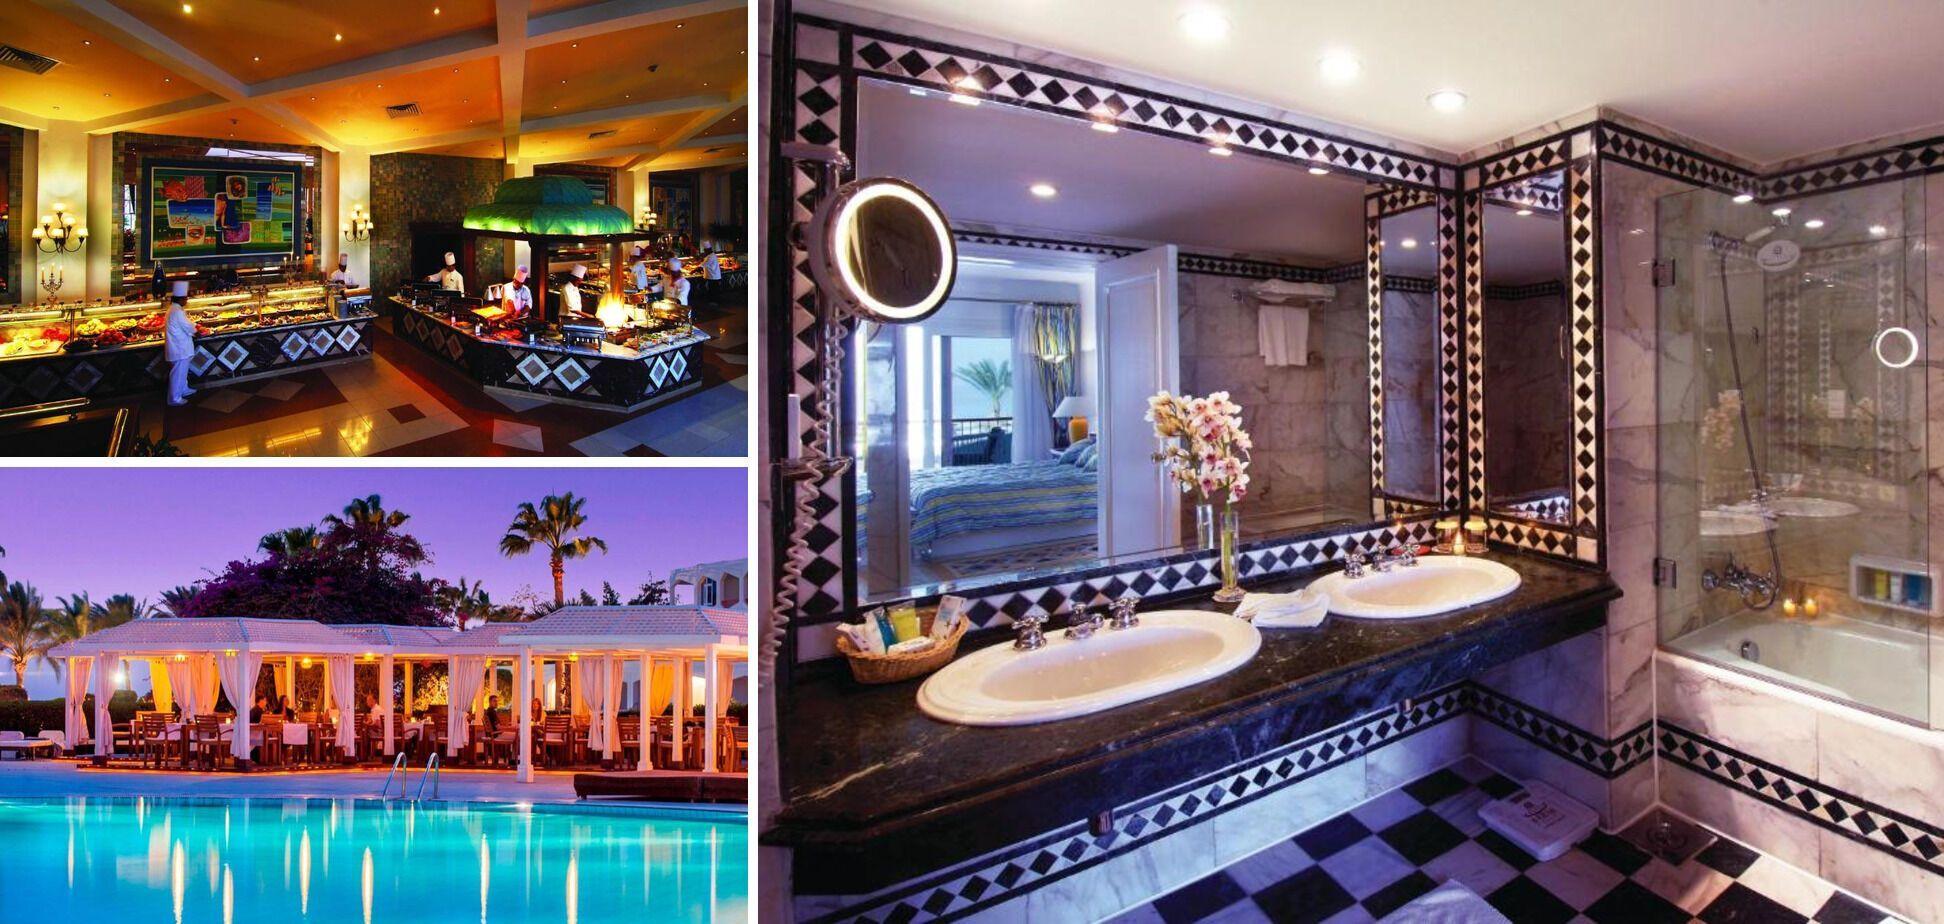 Baron Resort 5 * изнутри